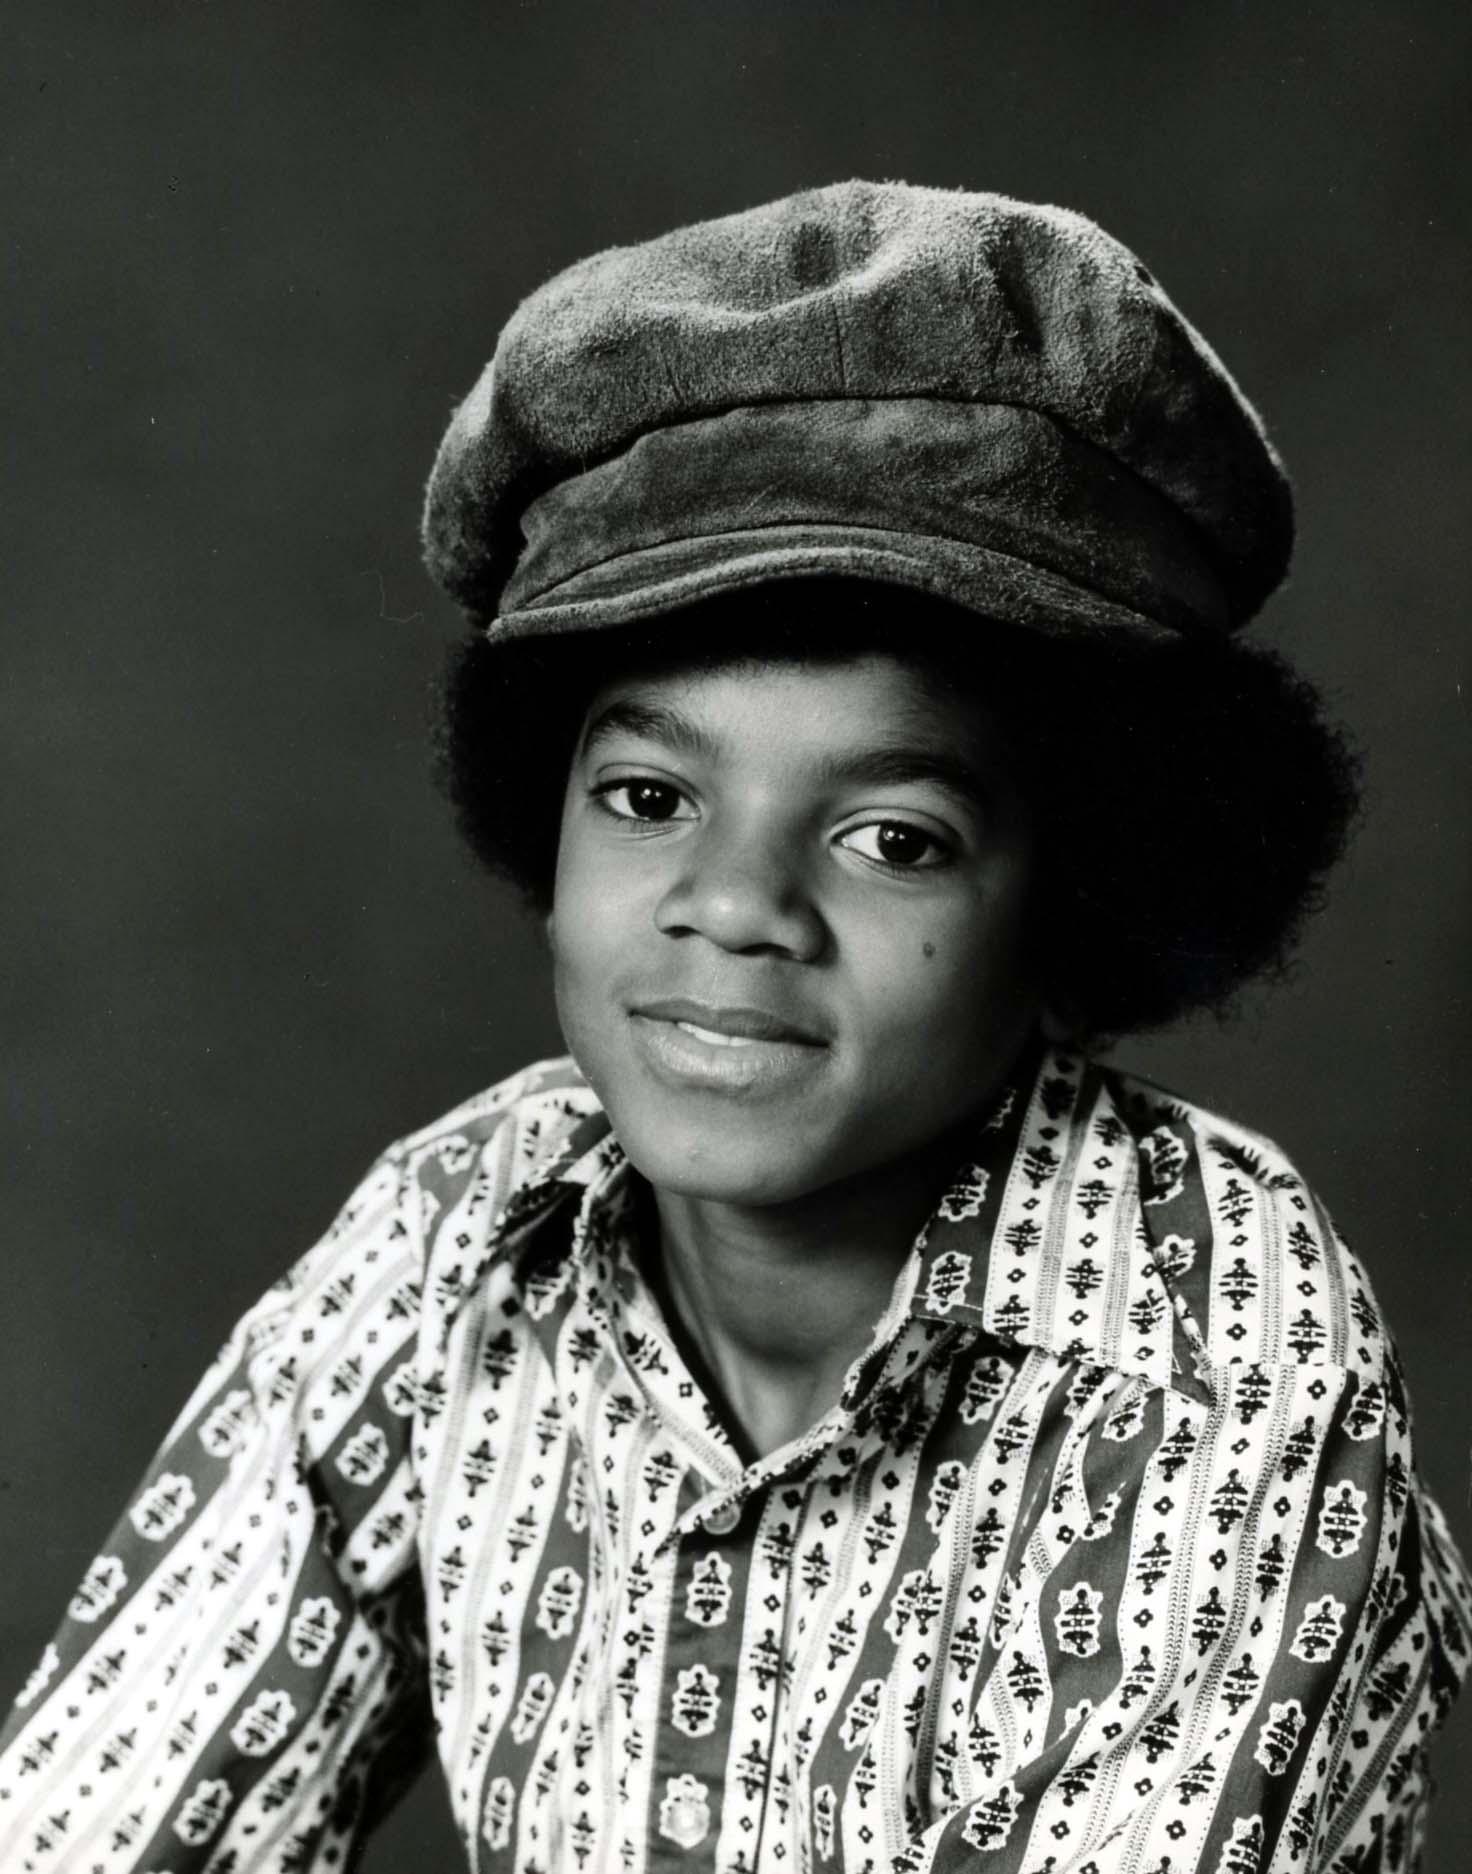 Young Michael Shrieve